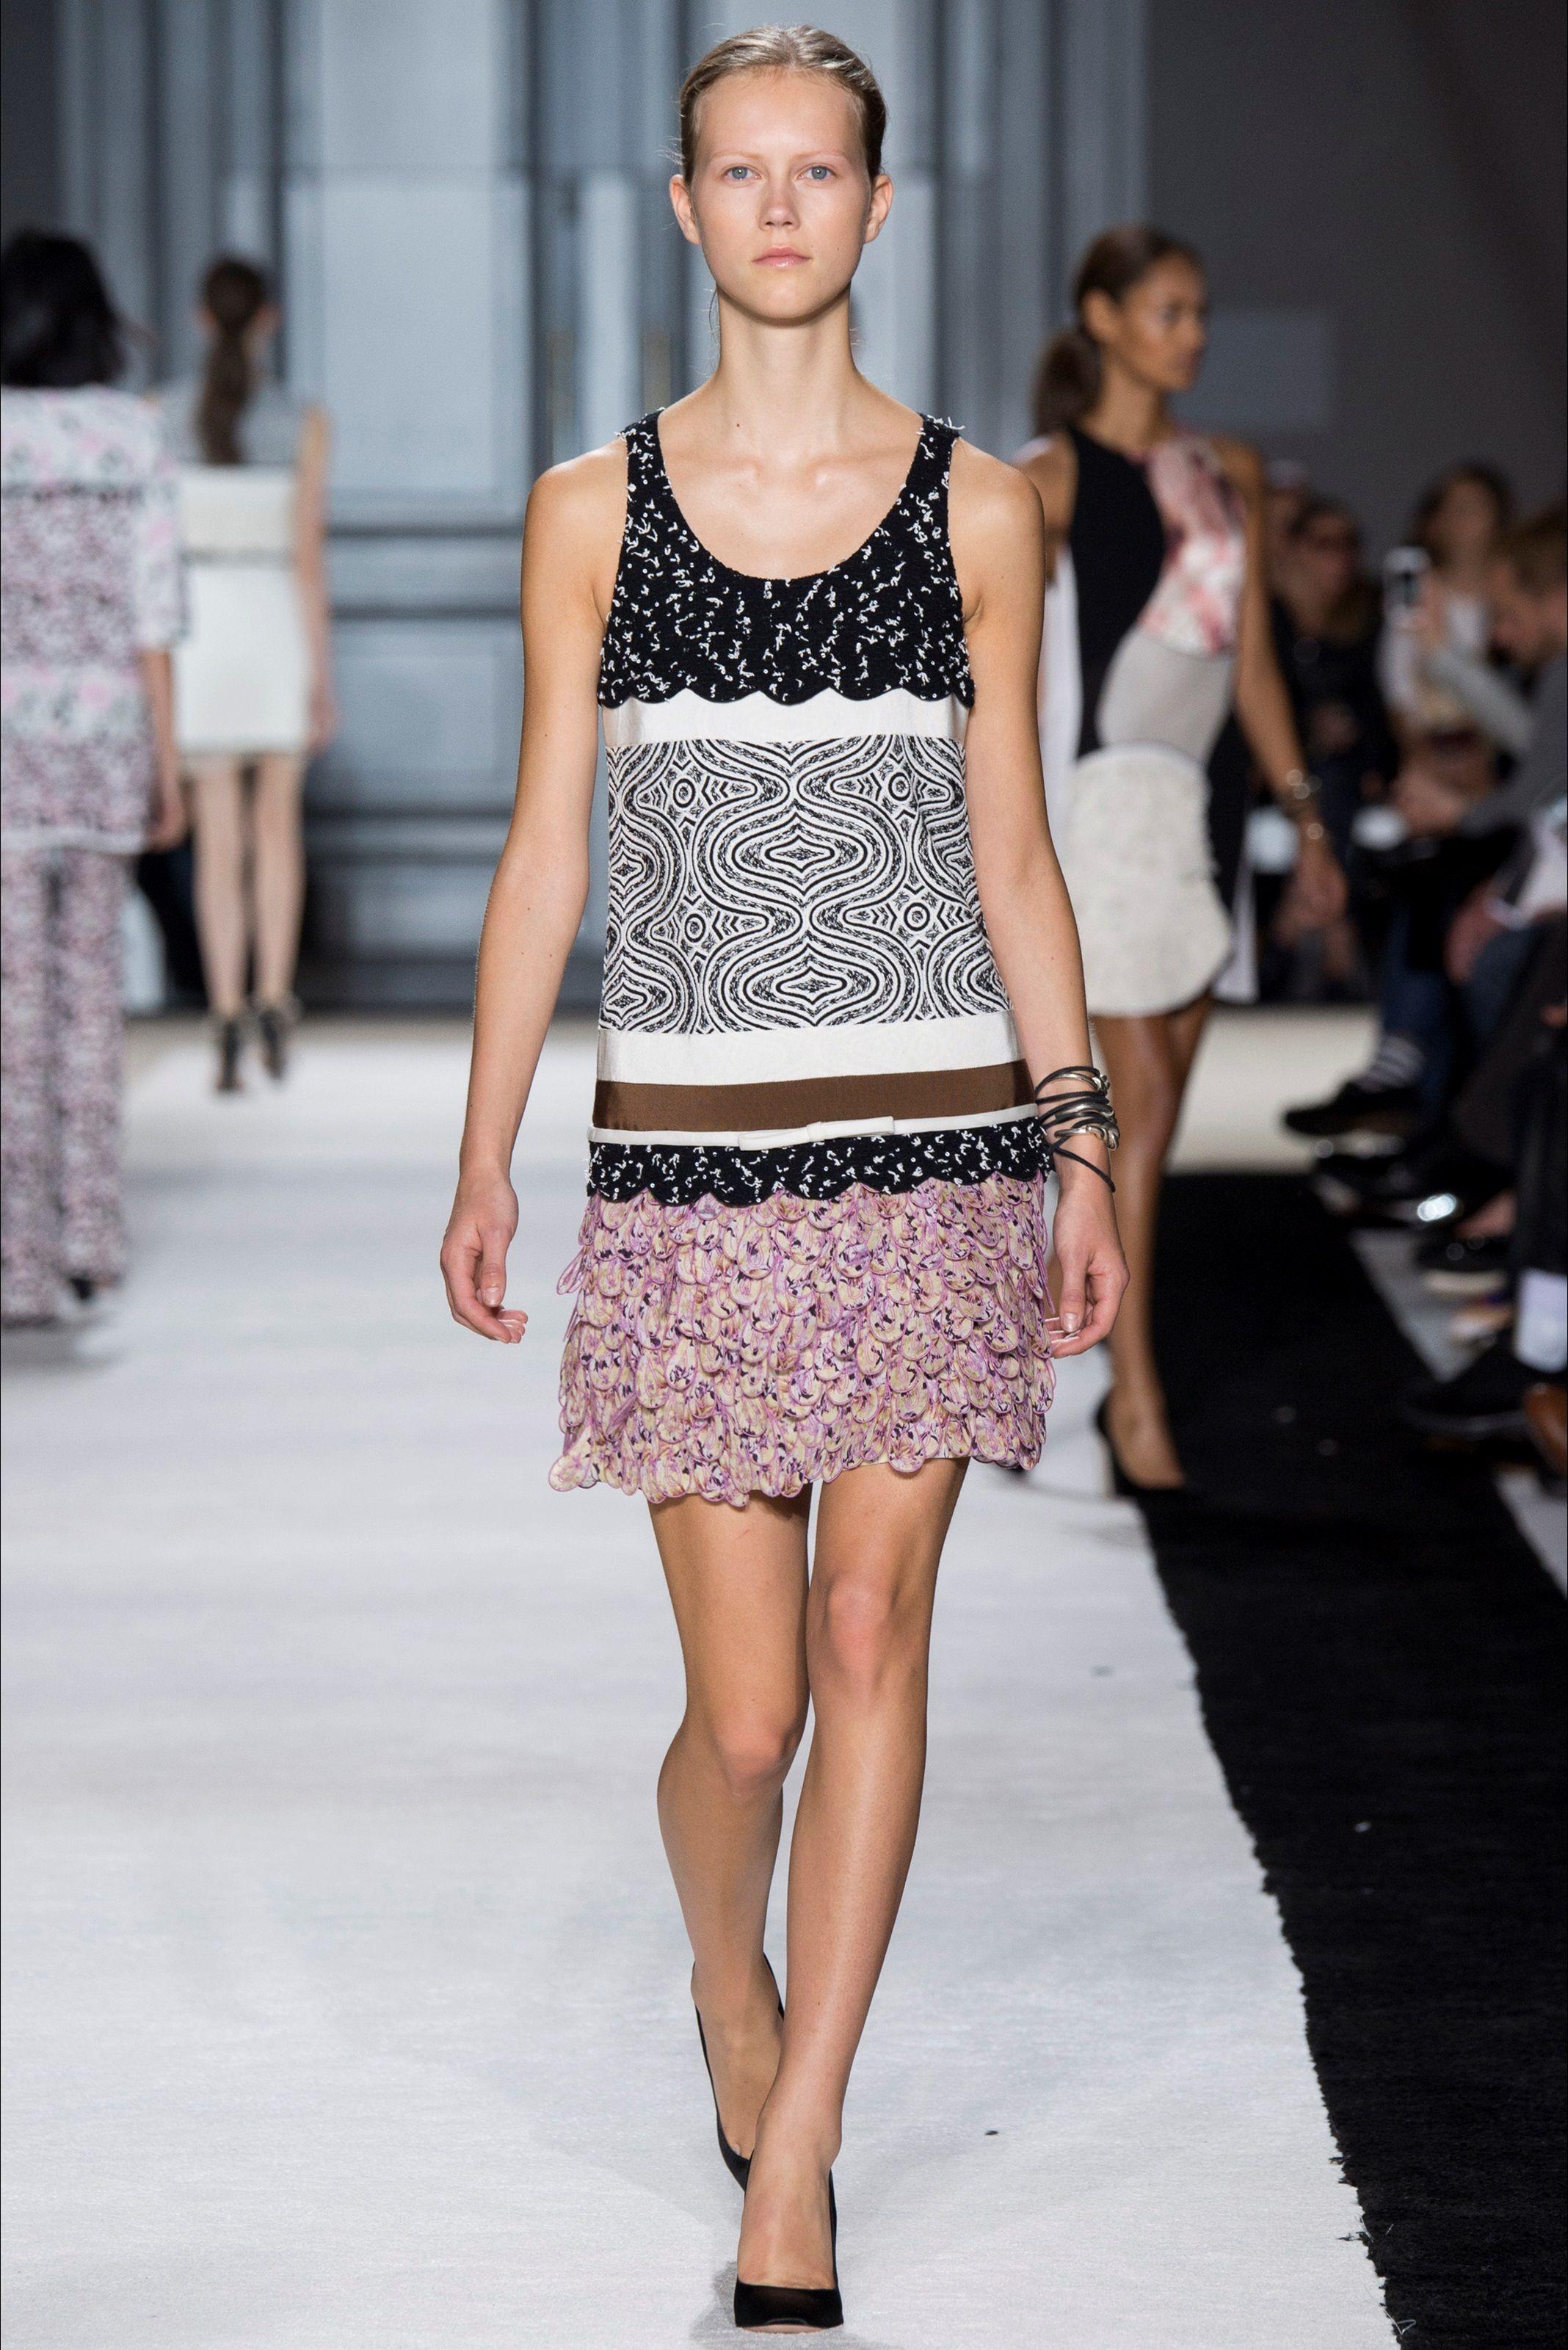 Sfilata Giambattista Valli Parigi - Collezioni Primavera Estate 2015 - Vogue